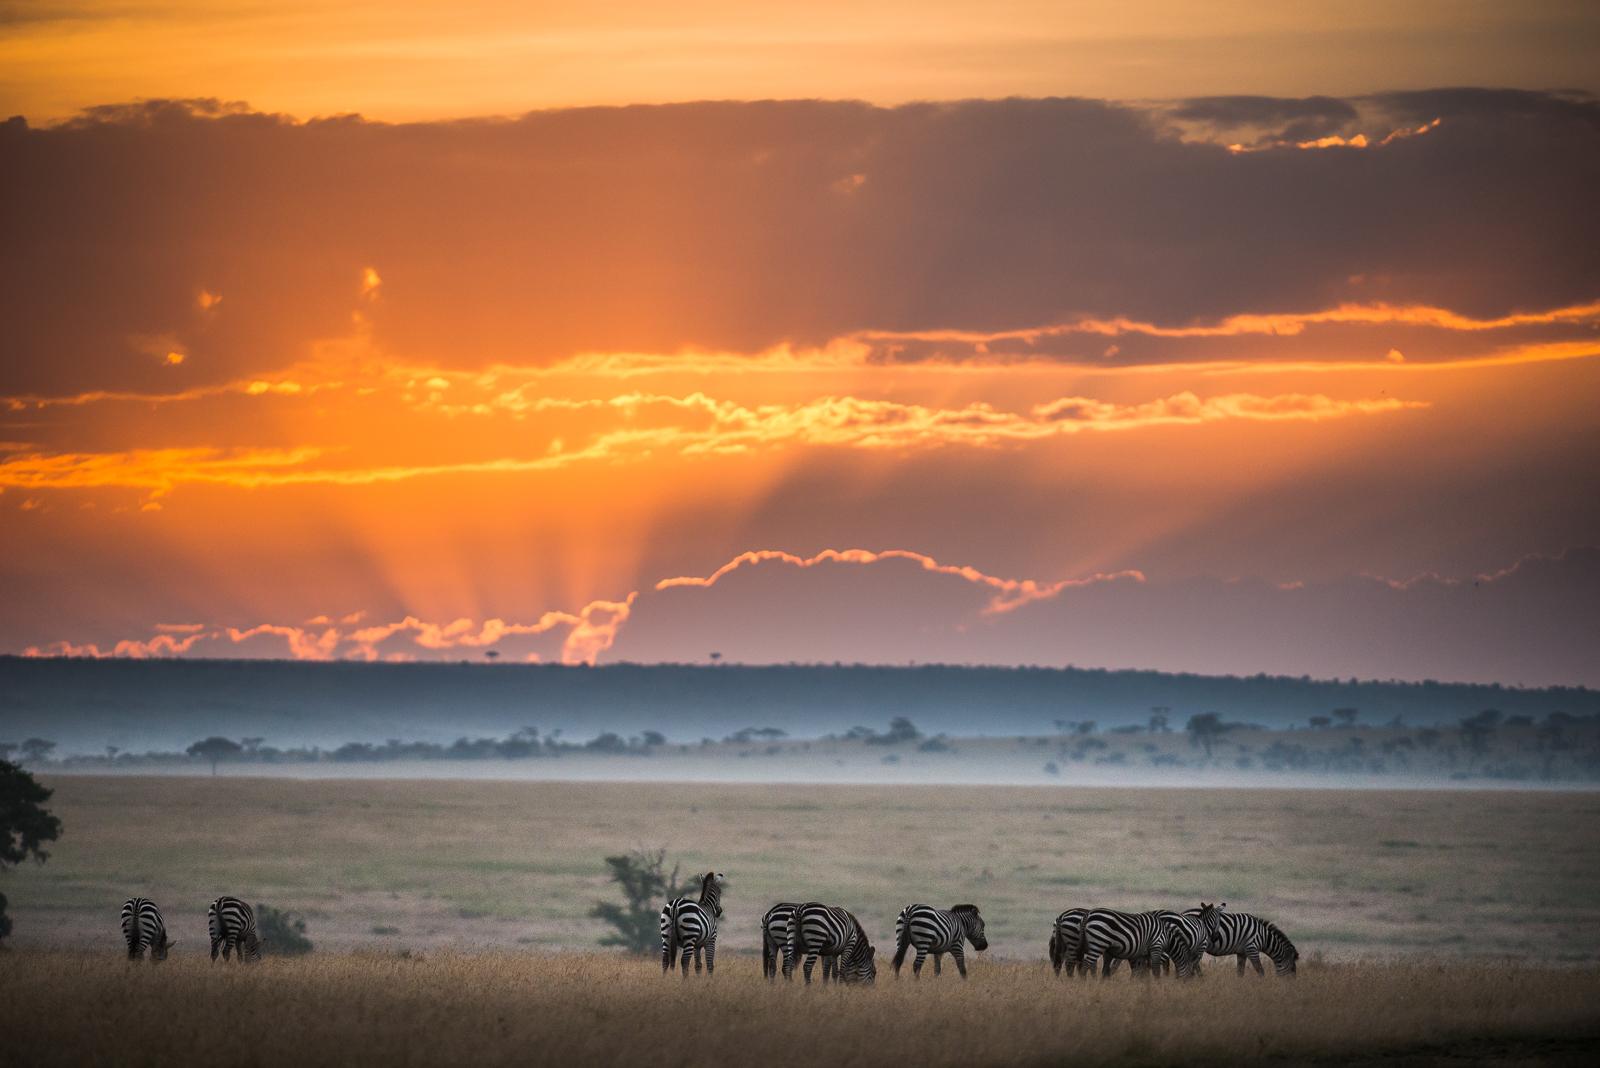 Zebra, Maasai Mara National Reserve, Kenya